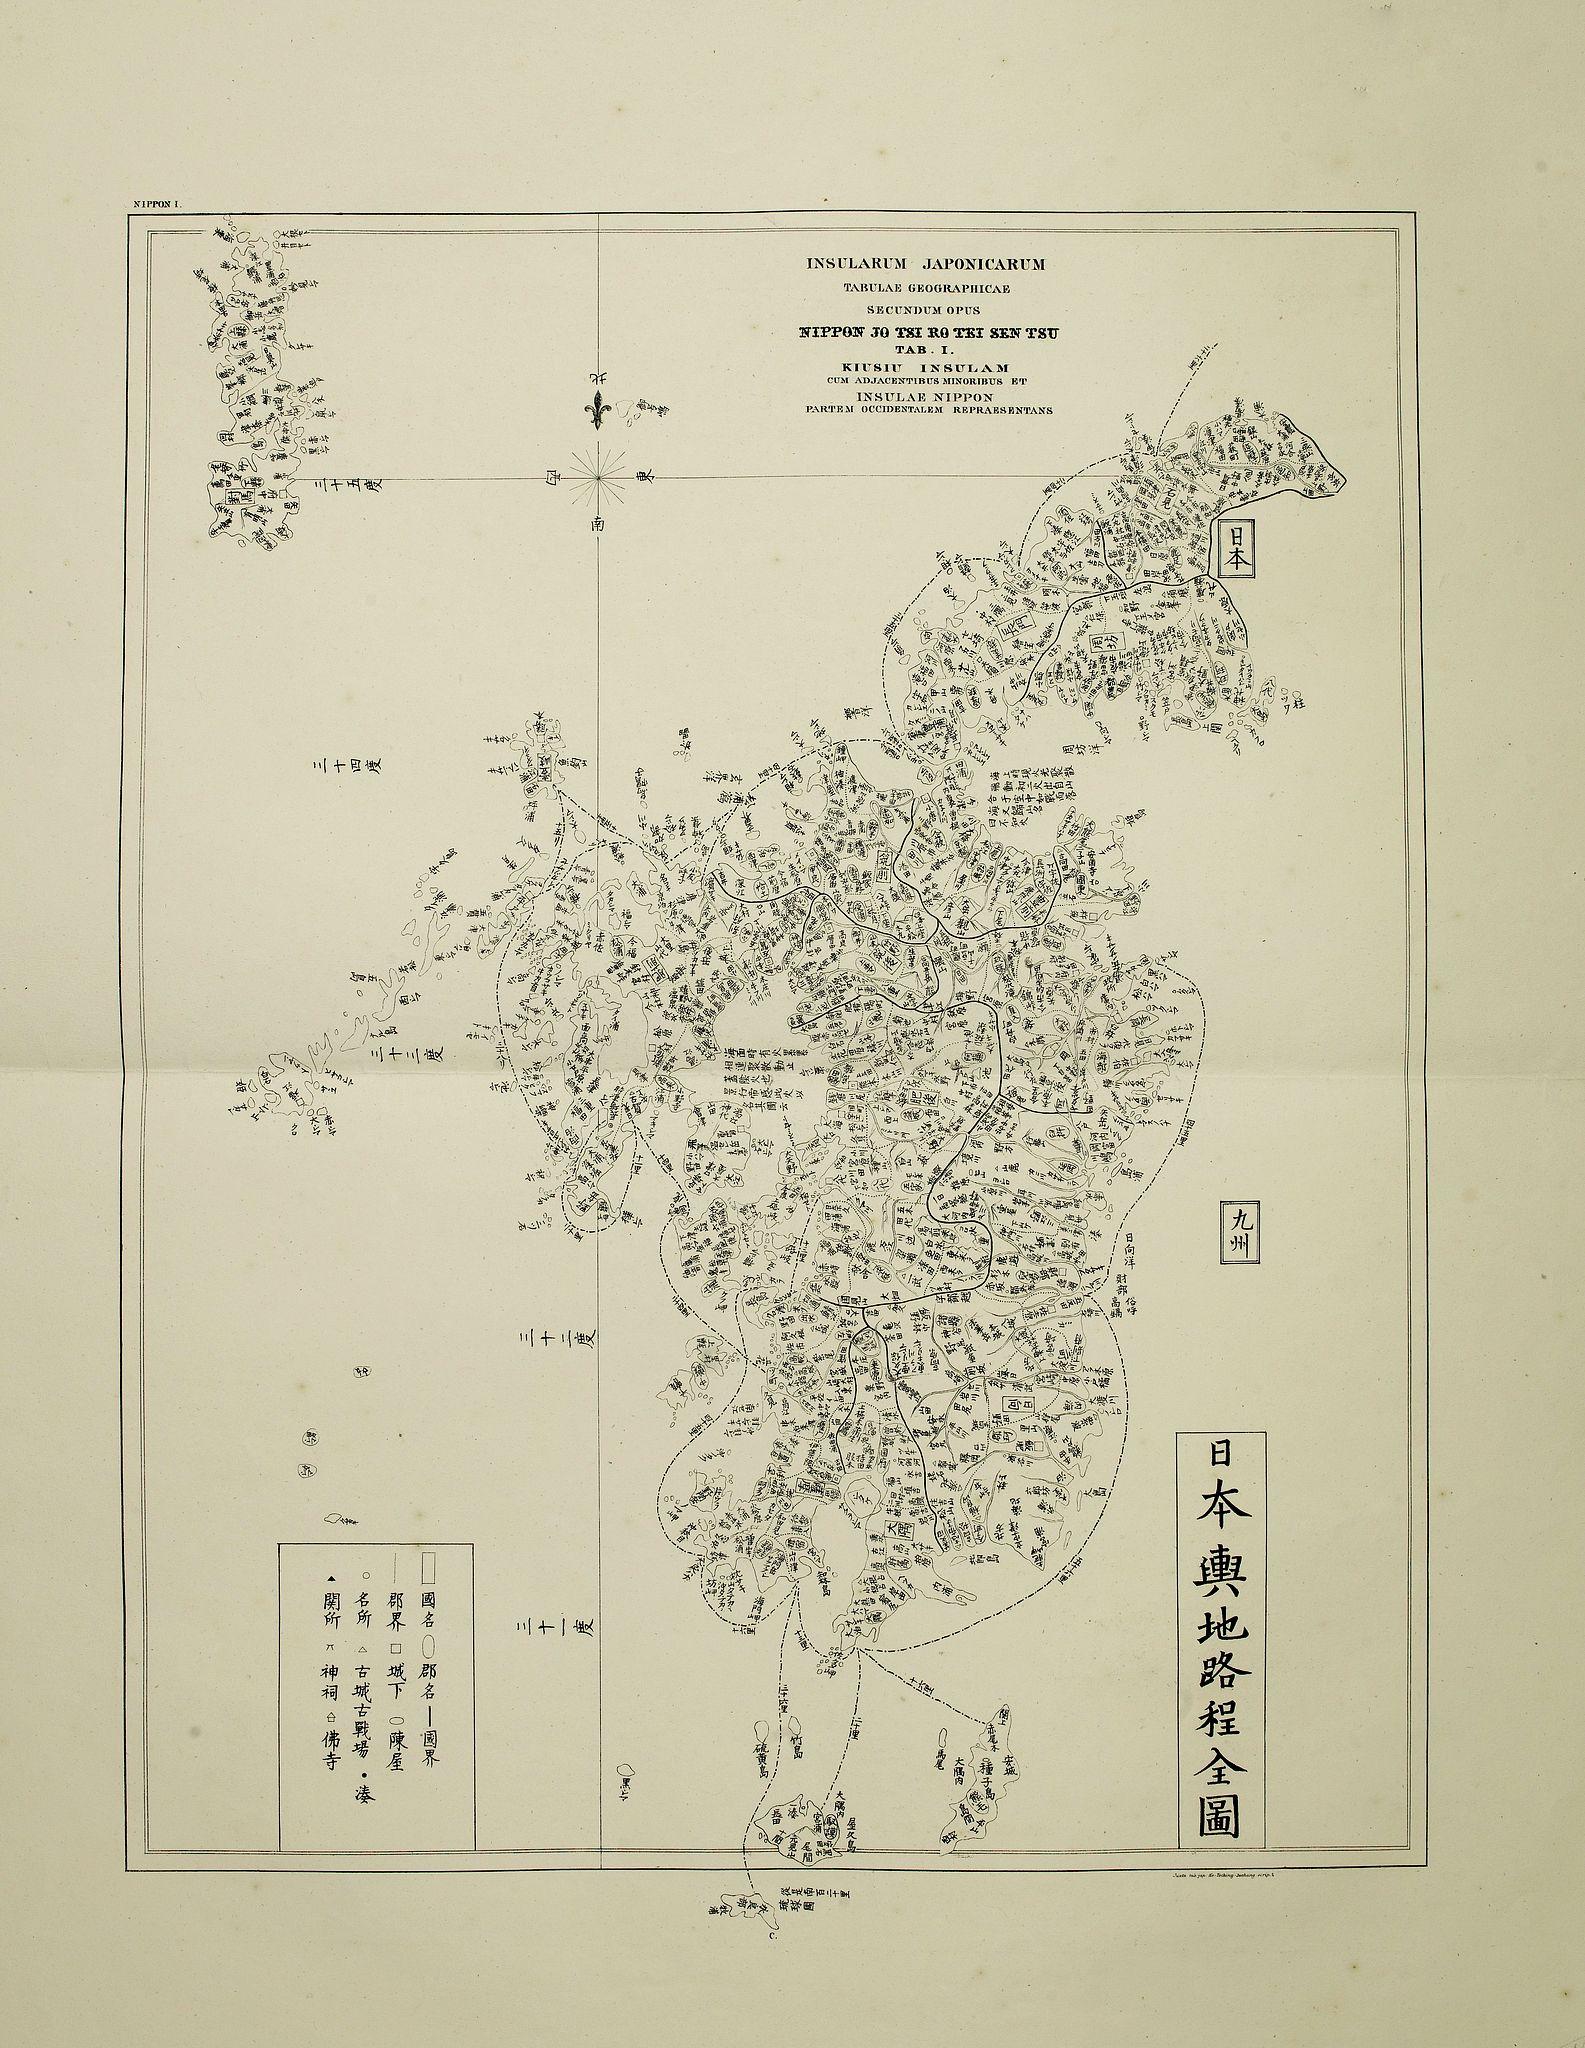 VON SIEBOLD, P. Fr. B. -  Insularum Japonicarum tabulae geographicae secundum opus NIPPON JO TSI RO TEI SEN TSU Tab. I Kiusui Insularum. . .